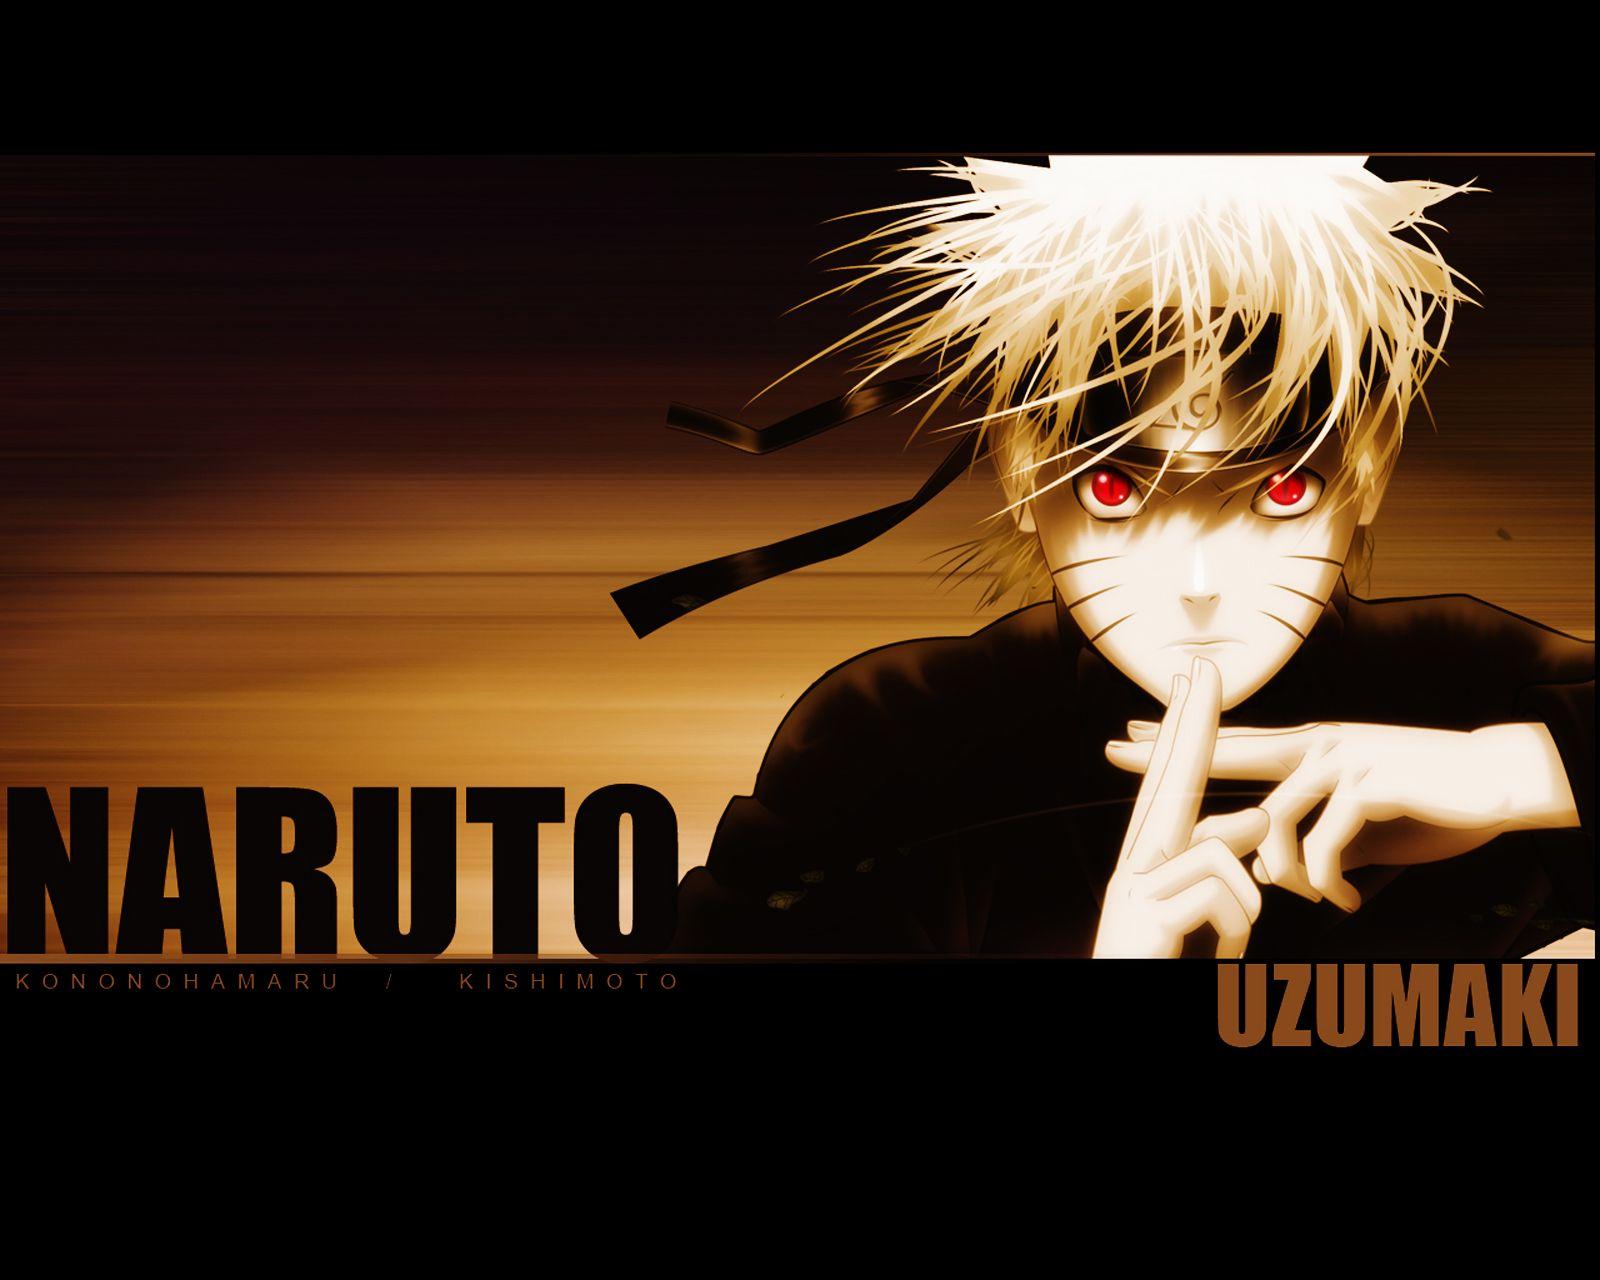 naruto uzumaki kagebushin anime hd wallpapers free download | anime